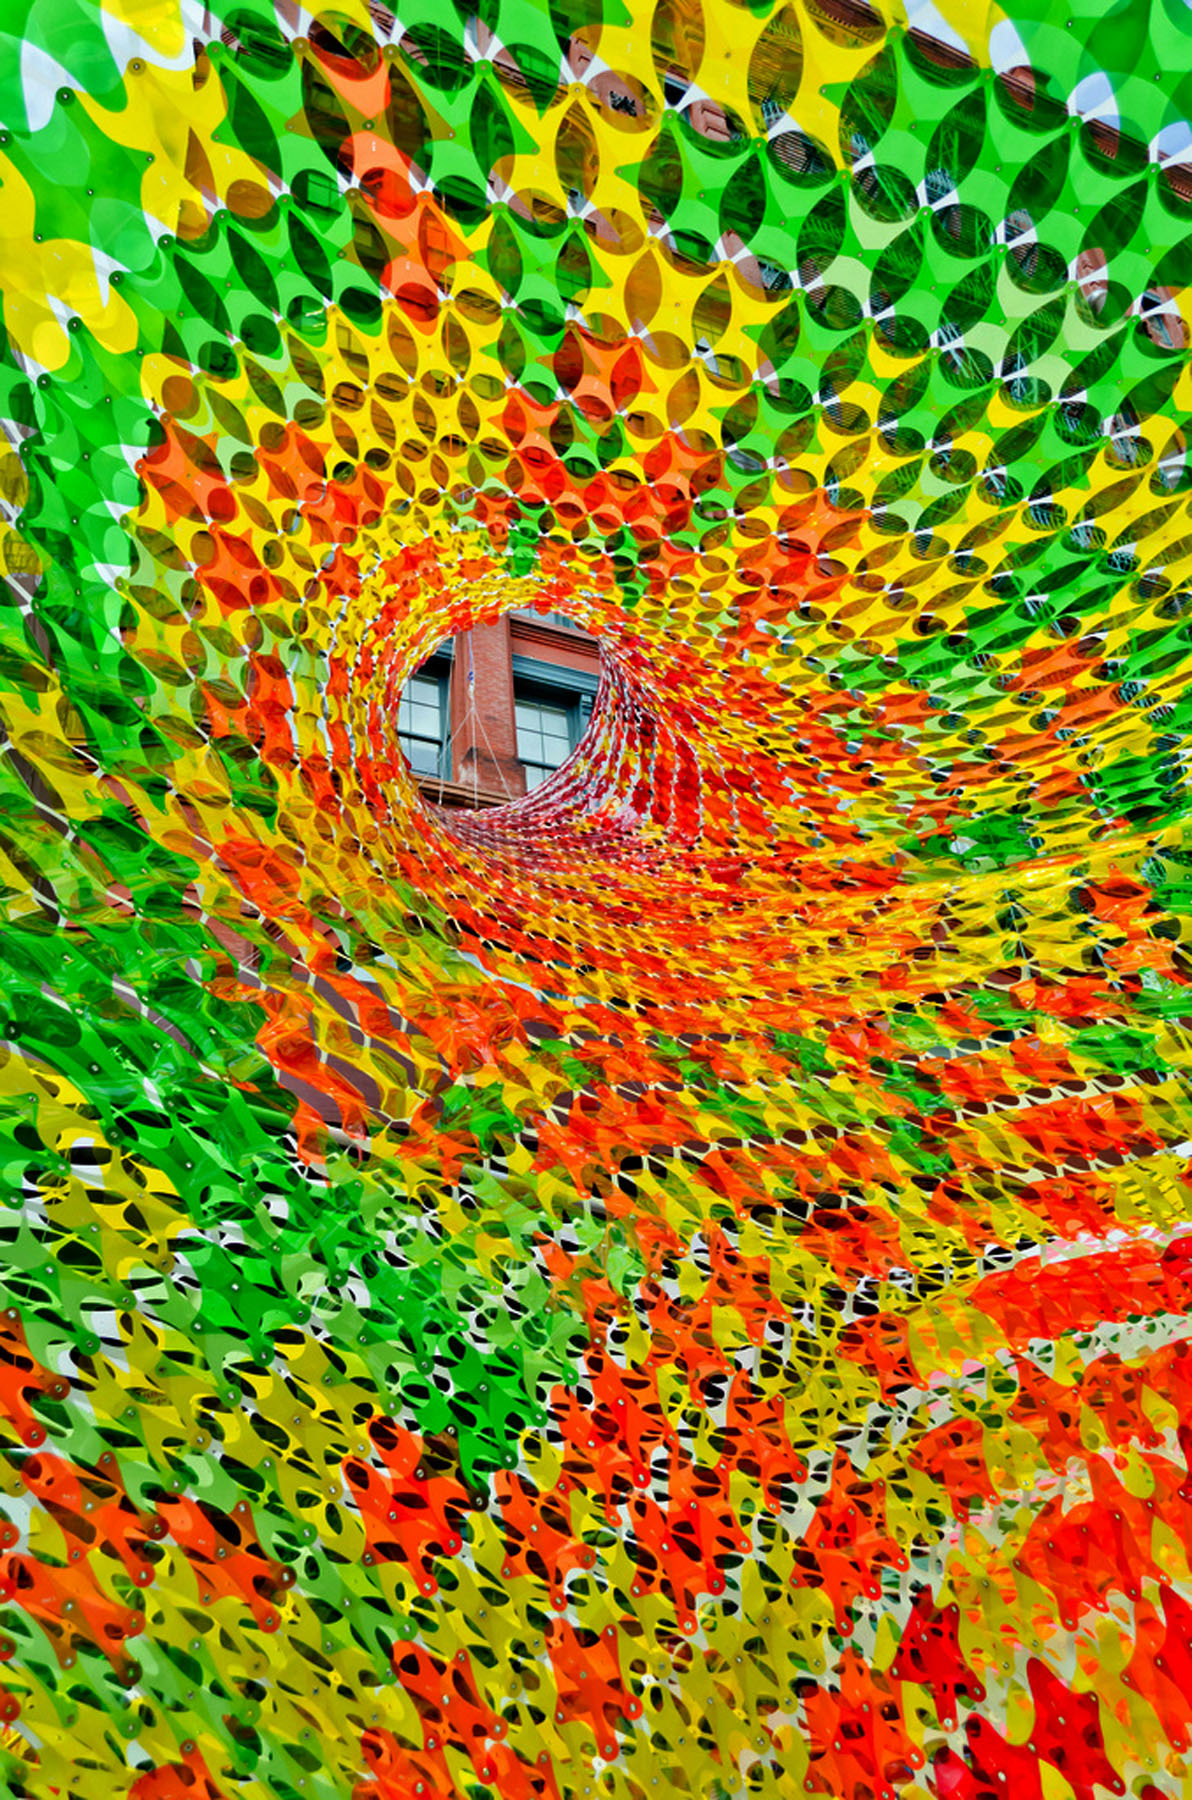 Xtra Moenia - San Gennaro Festival Sculpture (Image: Softlab)